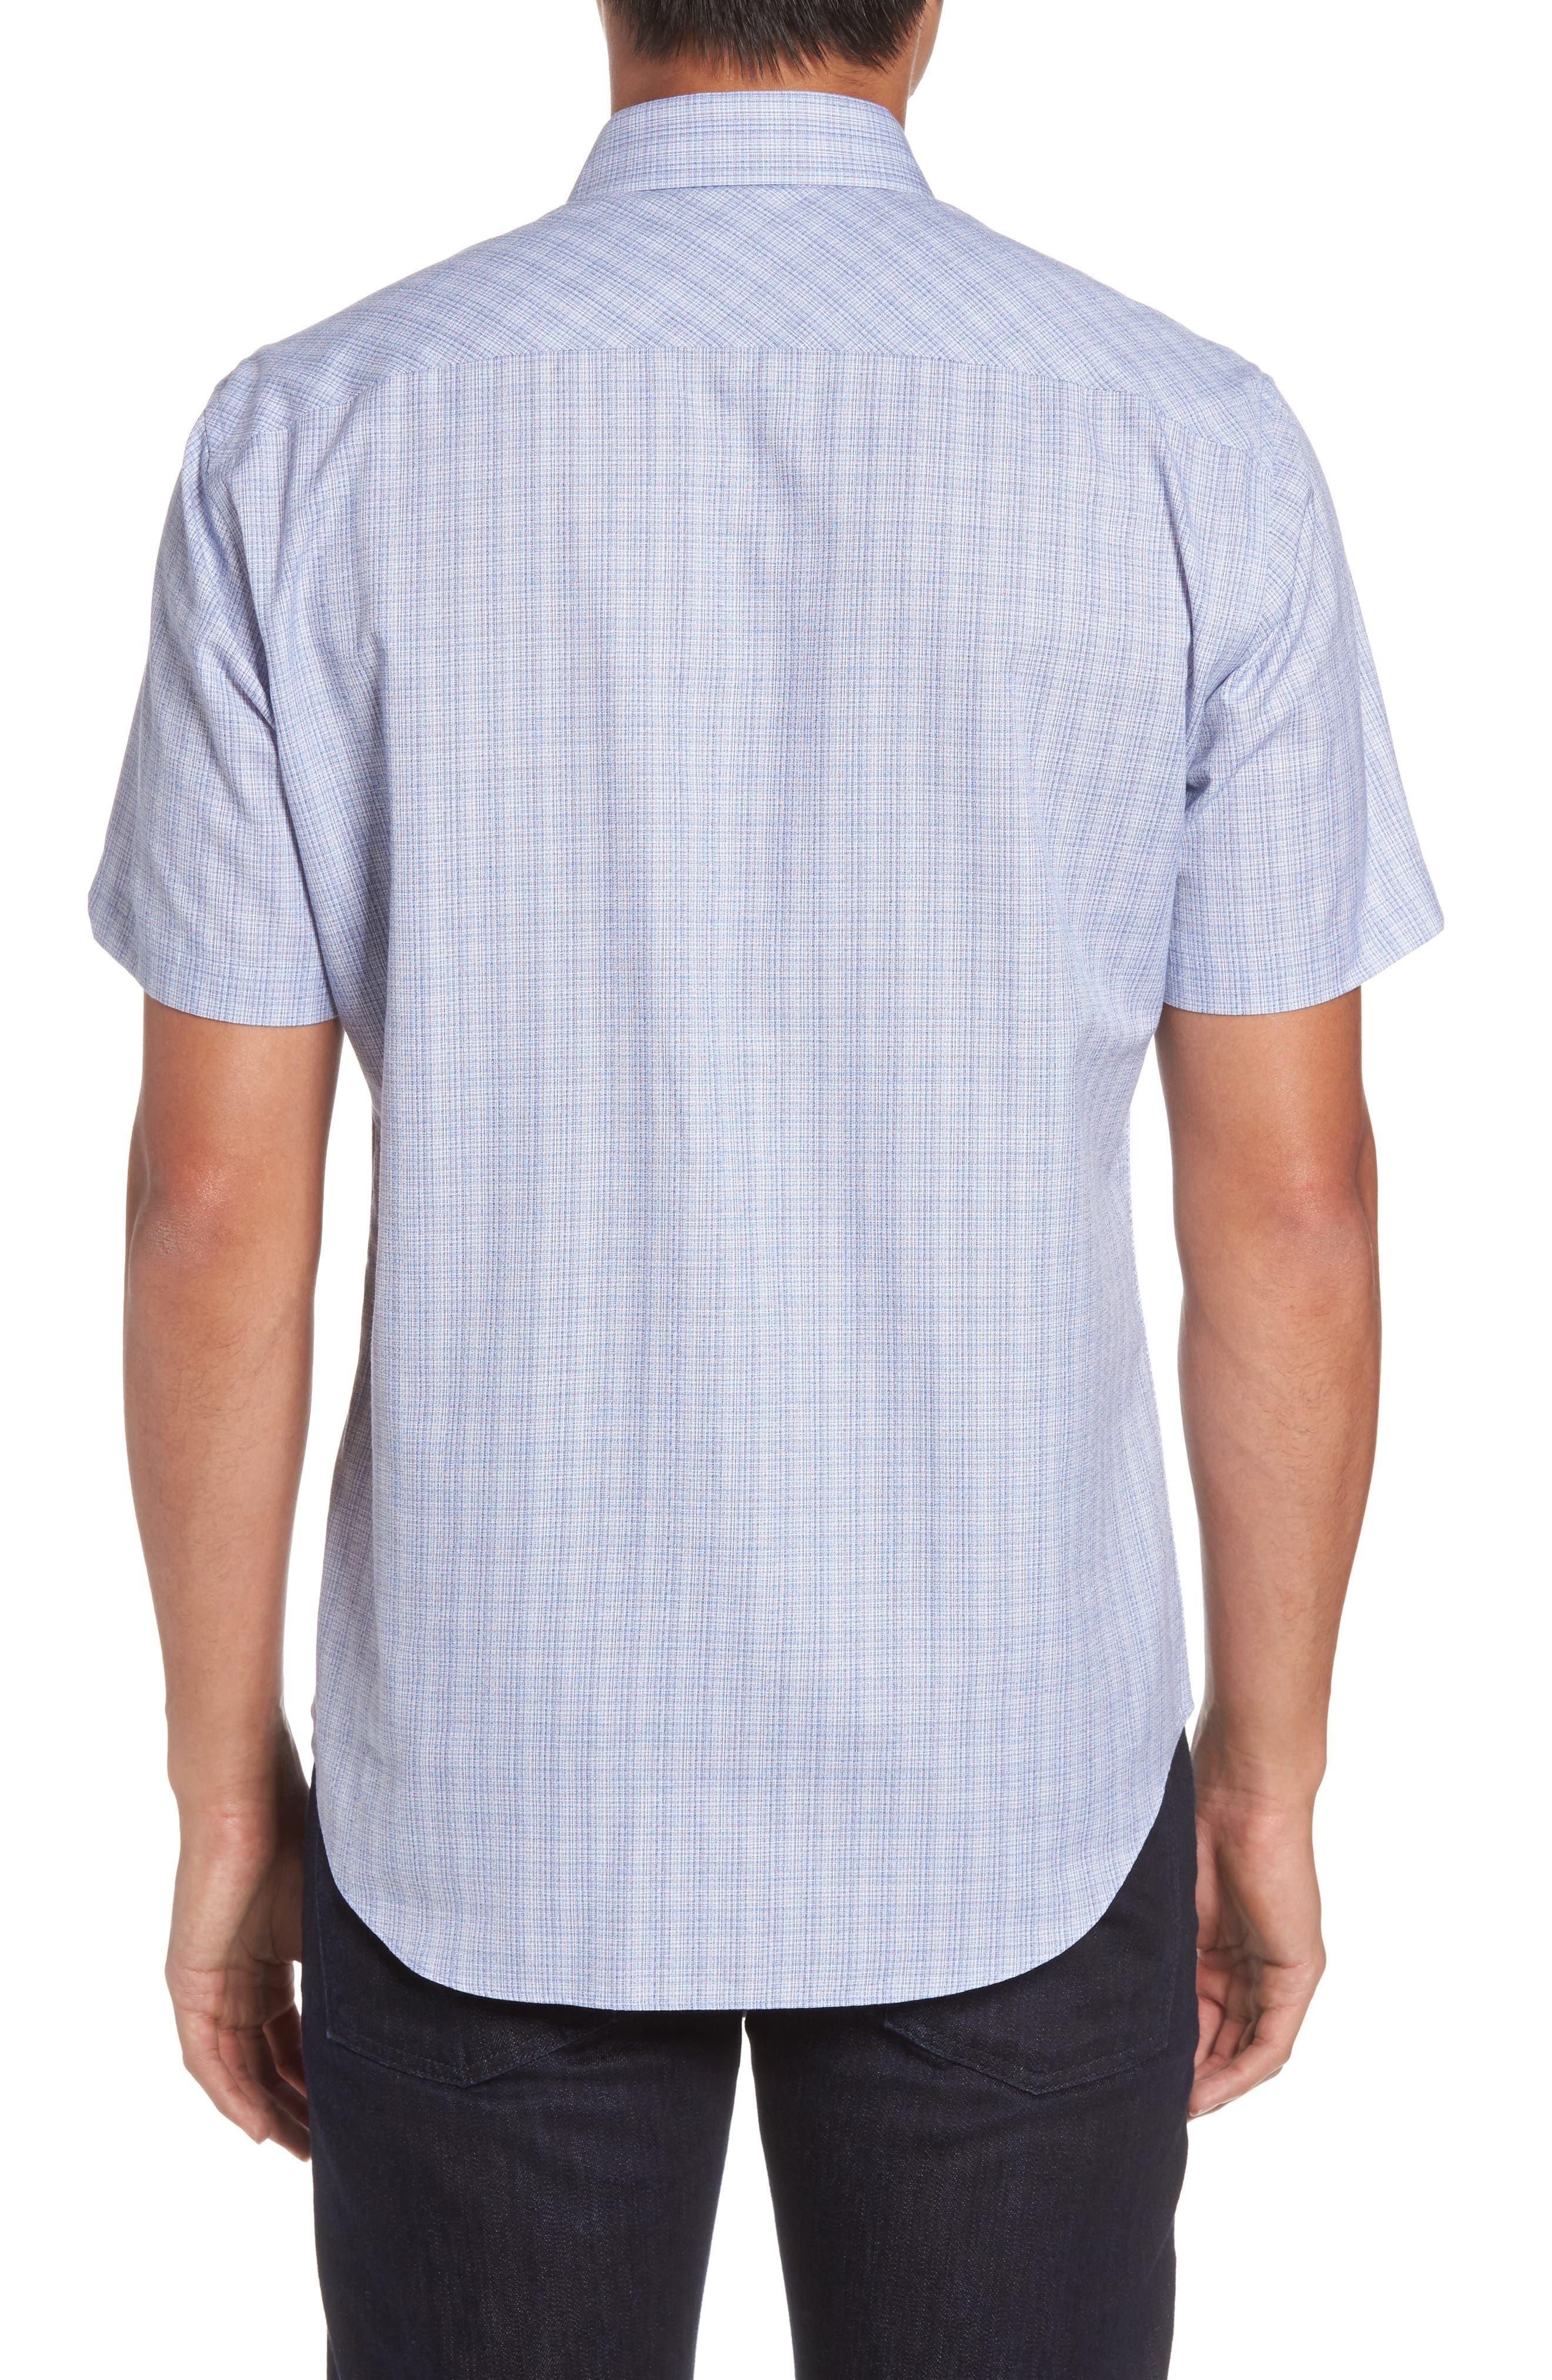 Zimmerman Check Sport Shirt,                             Alternate thumbnail 2, color,                             400